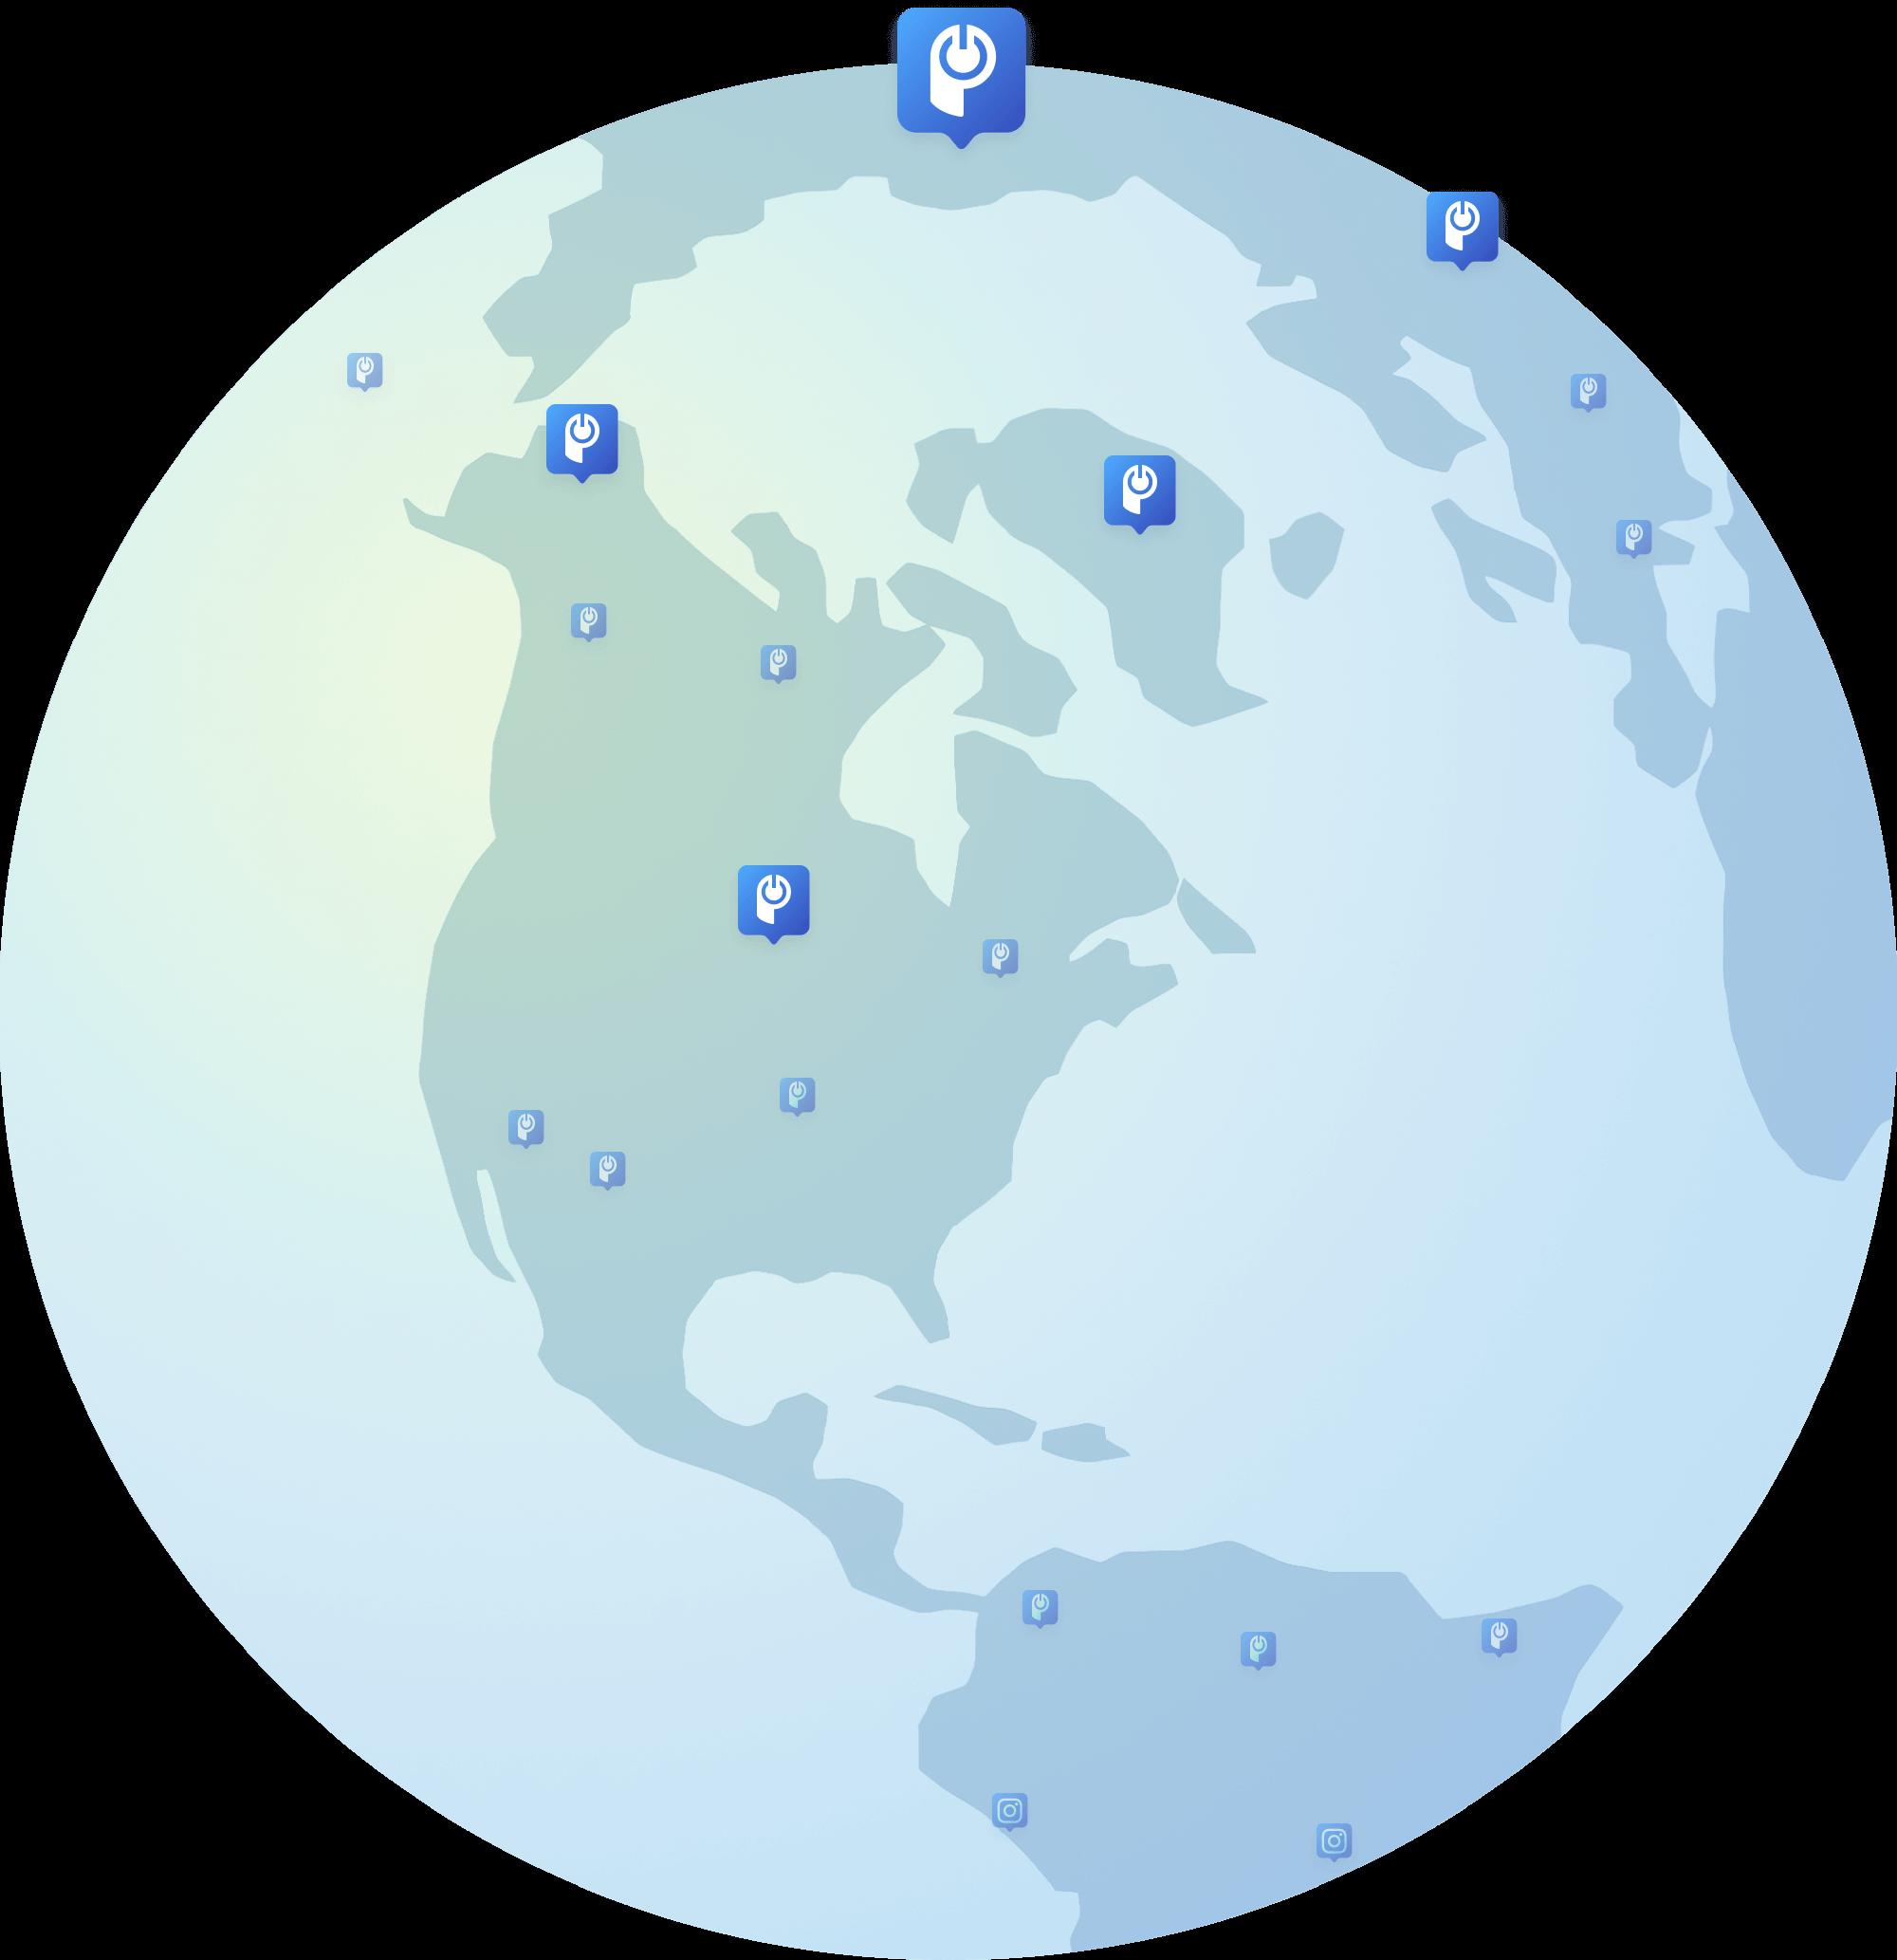 POWR globe